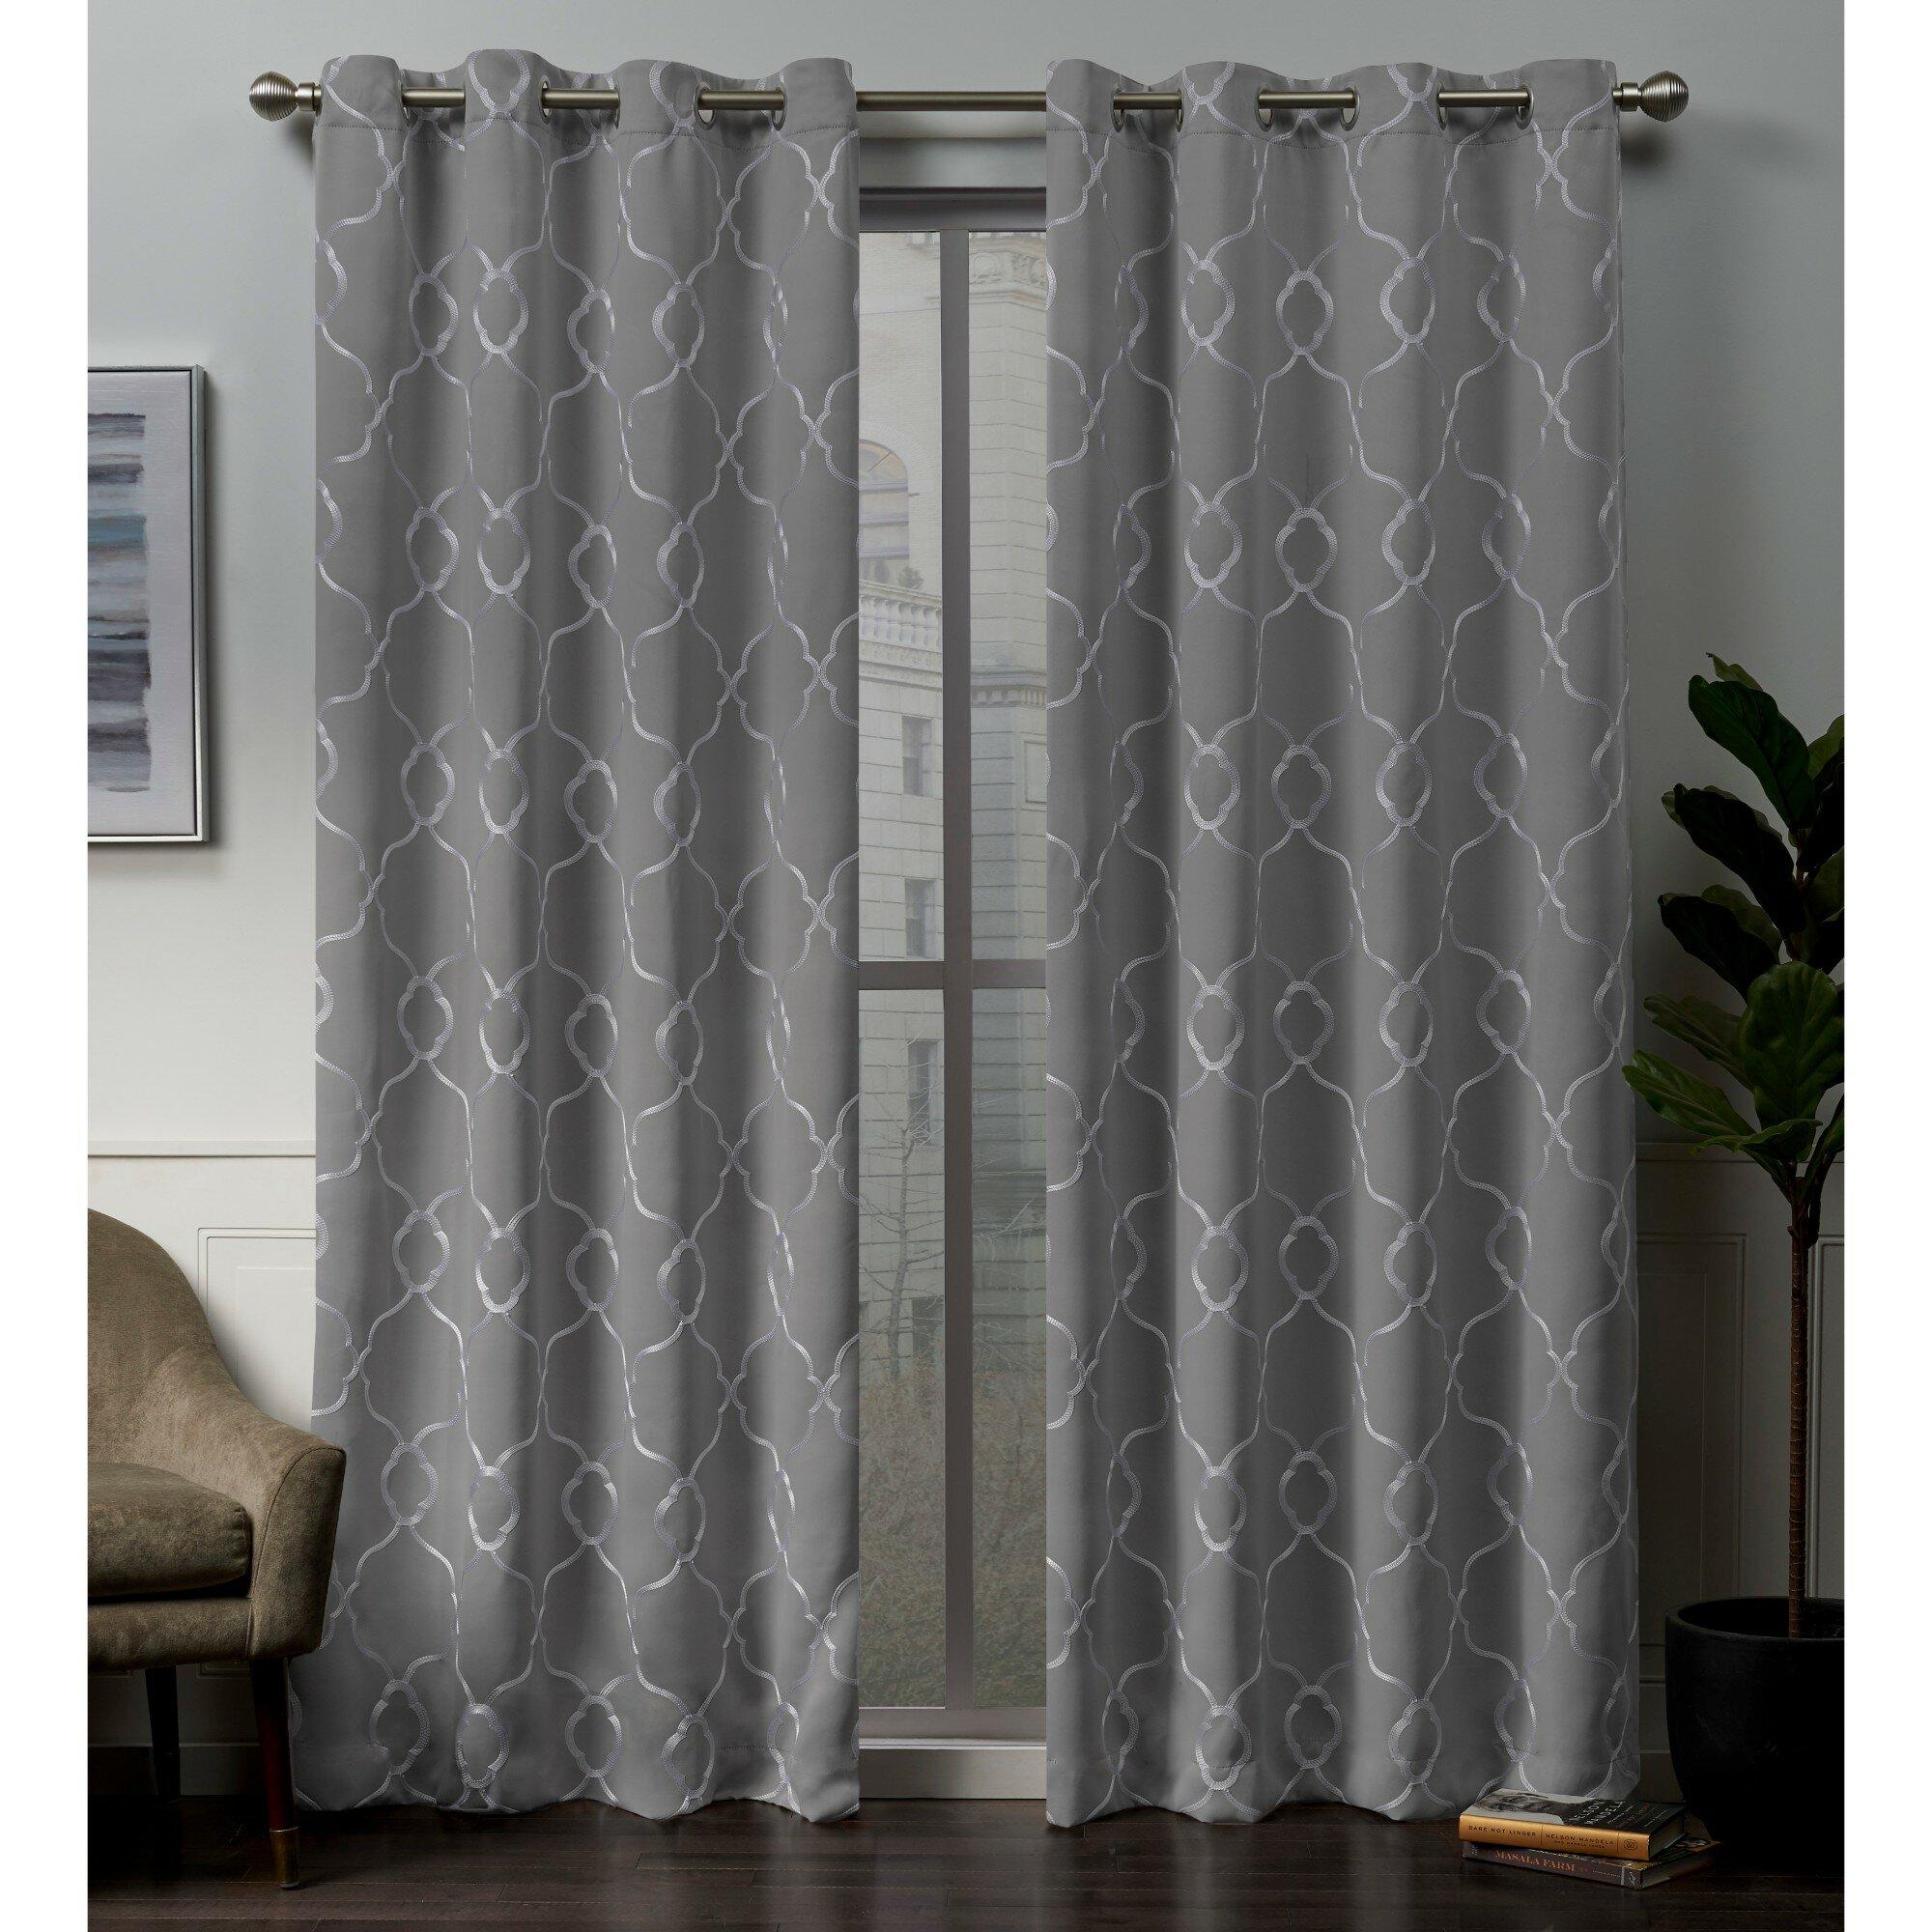 Darby Home Co Belew Geometric Blackout Thermal Grommet Curtain Panels Reviews Wayfair